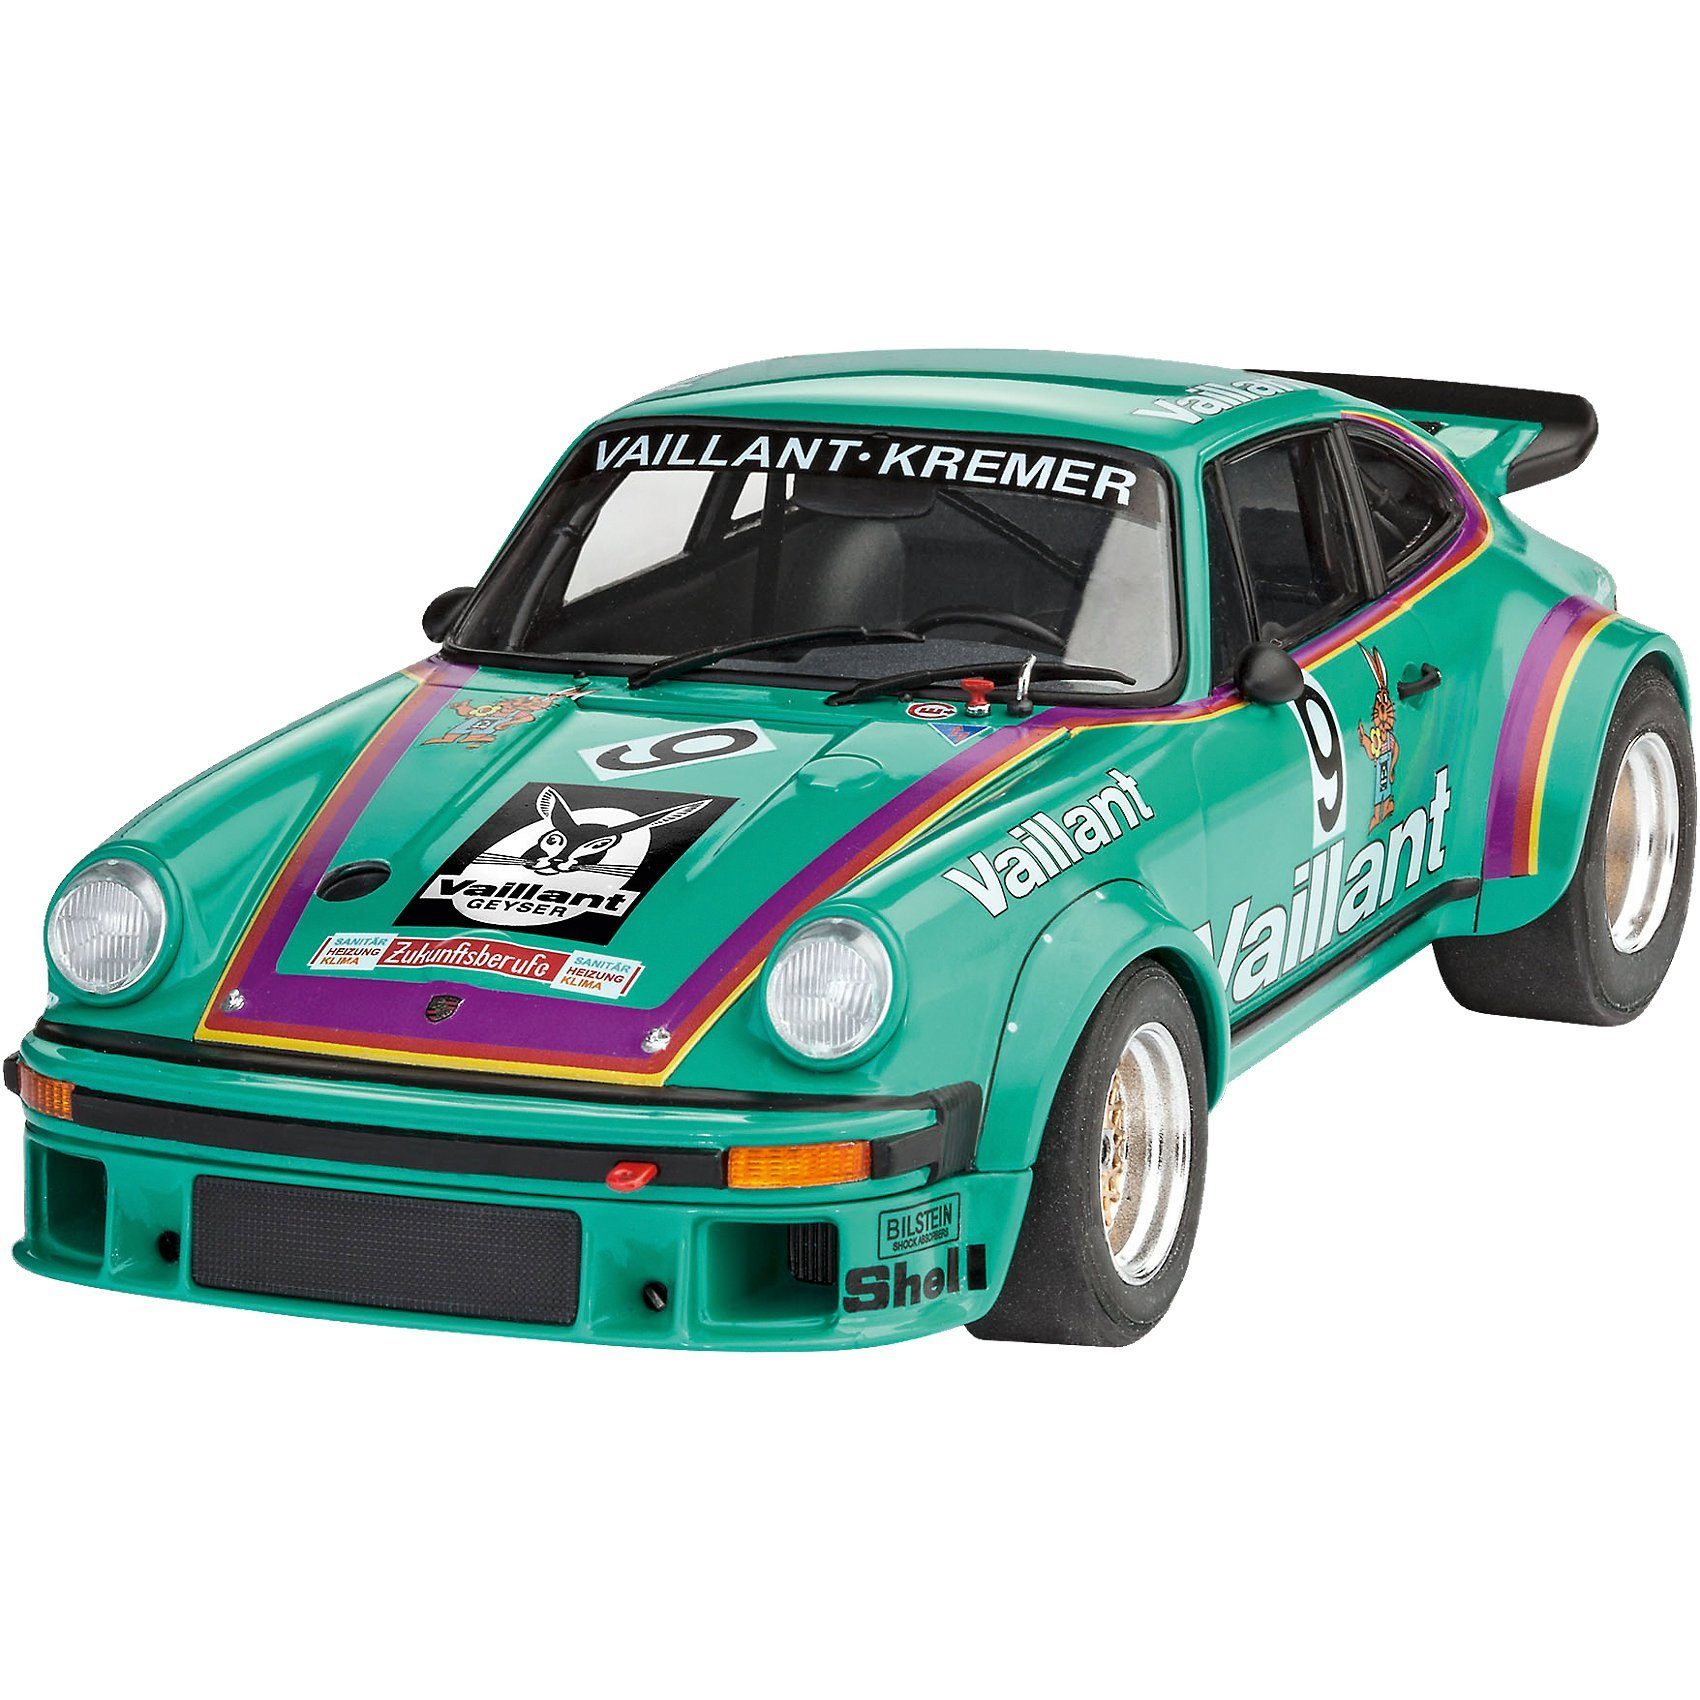 "Revell® Modellbausatz - Porsche 934 RSR ""Vaillant"""